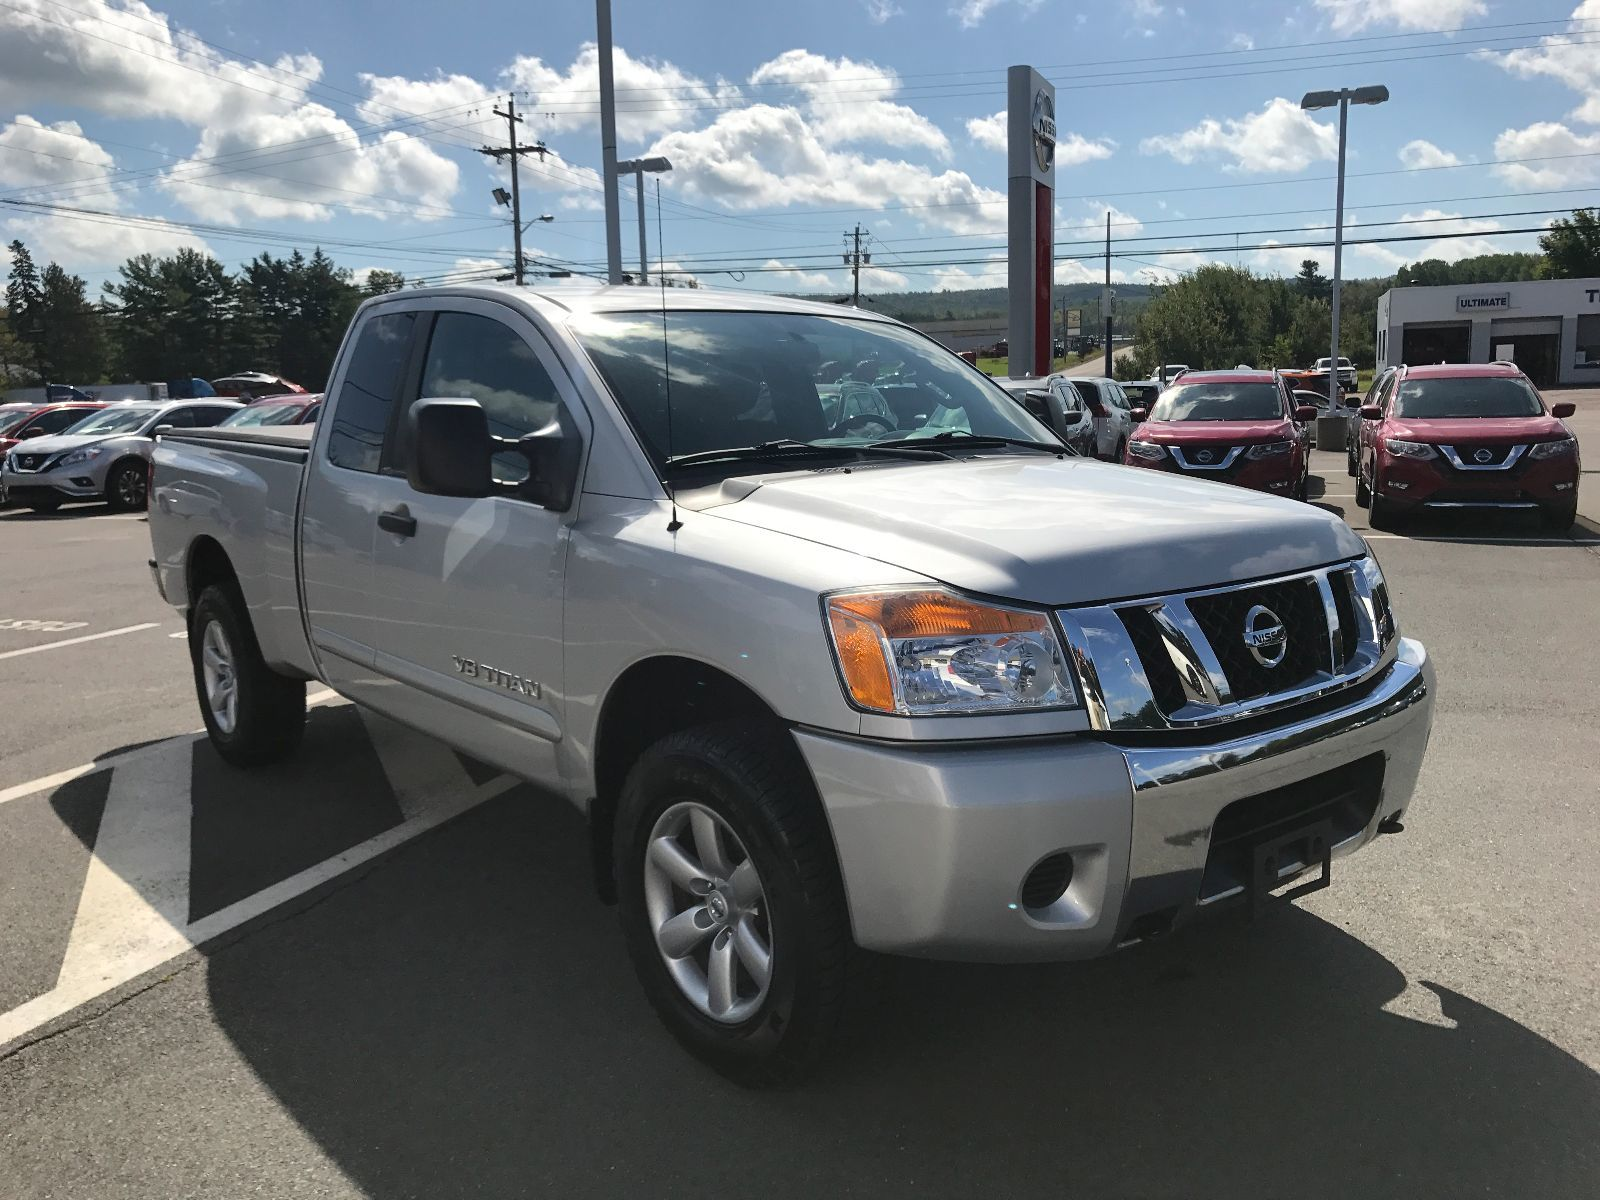 902 Auto Sales Used 2012 Nissan Titan for sale in Dartmouth